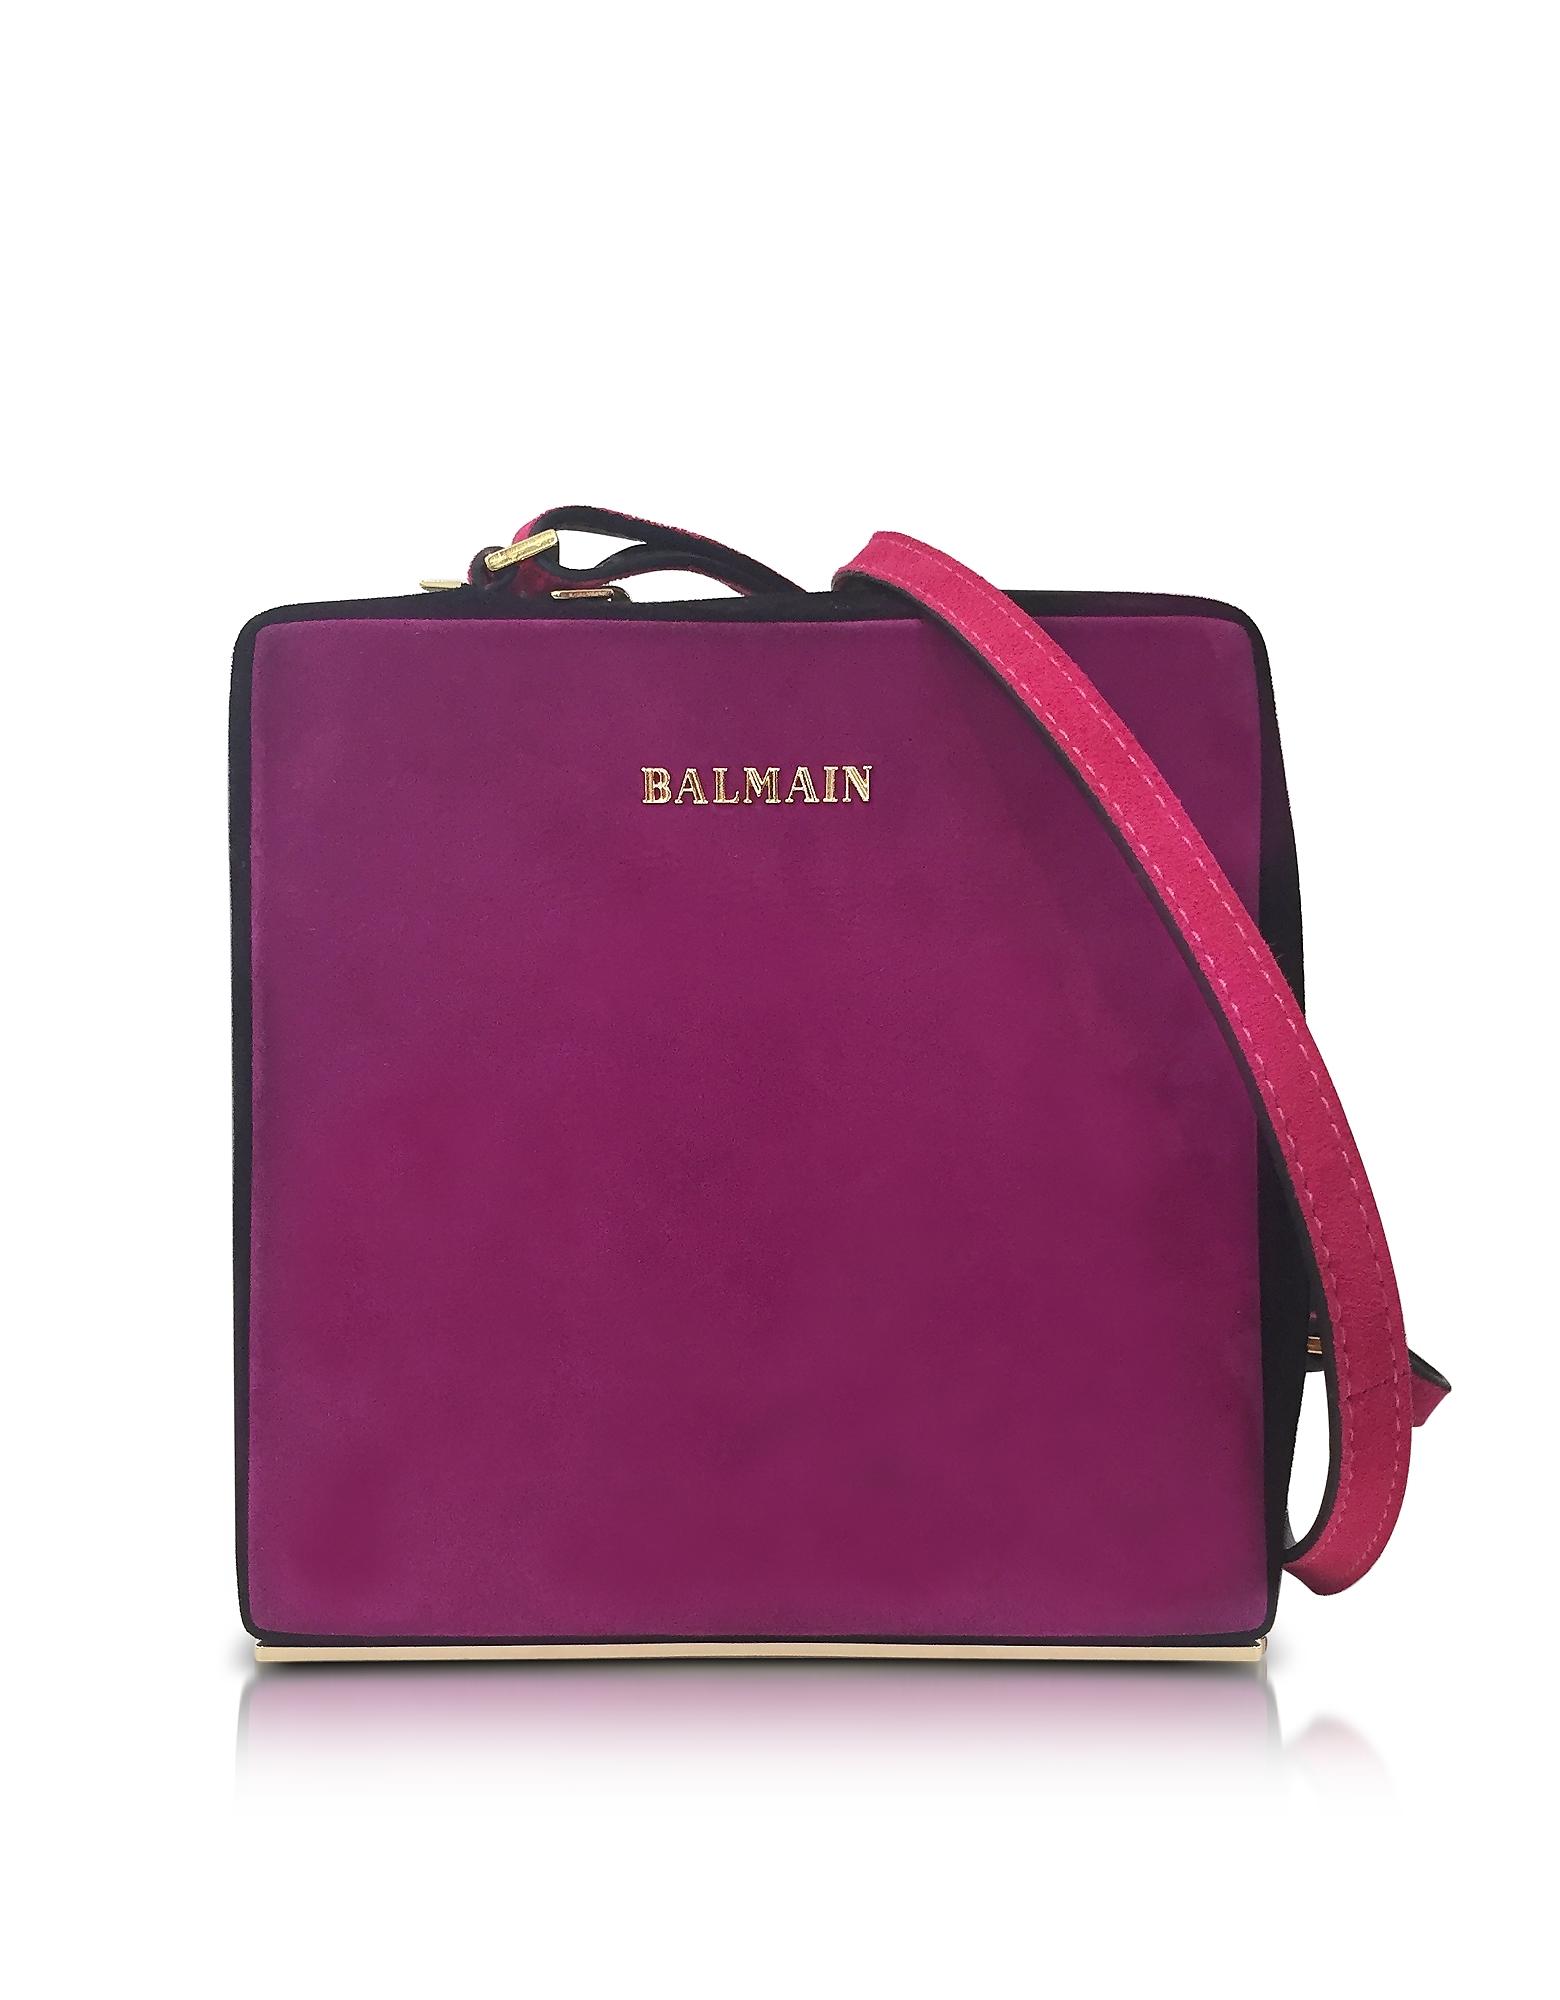 Balmain Pablito - Фиолетовая Бархатная Сумка на Плечо